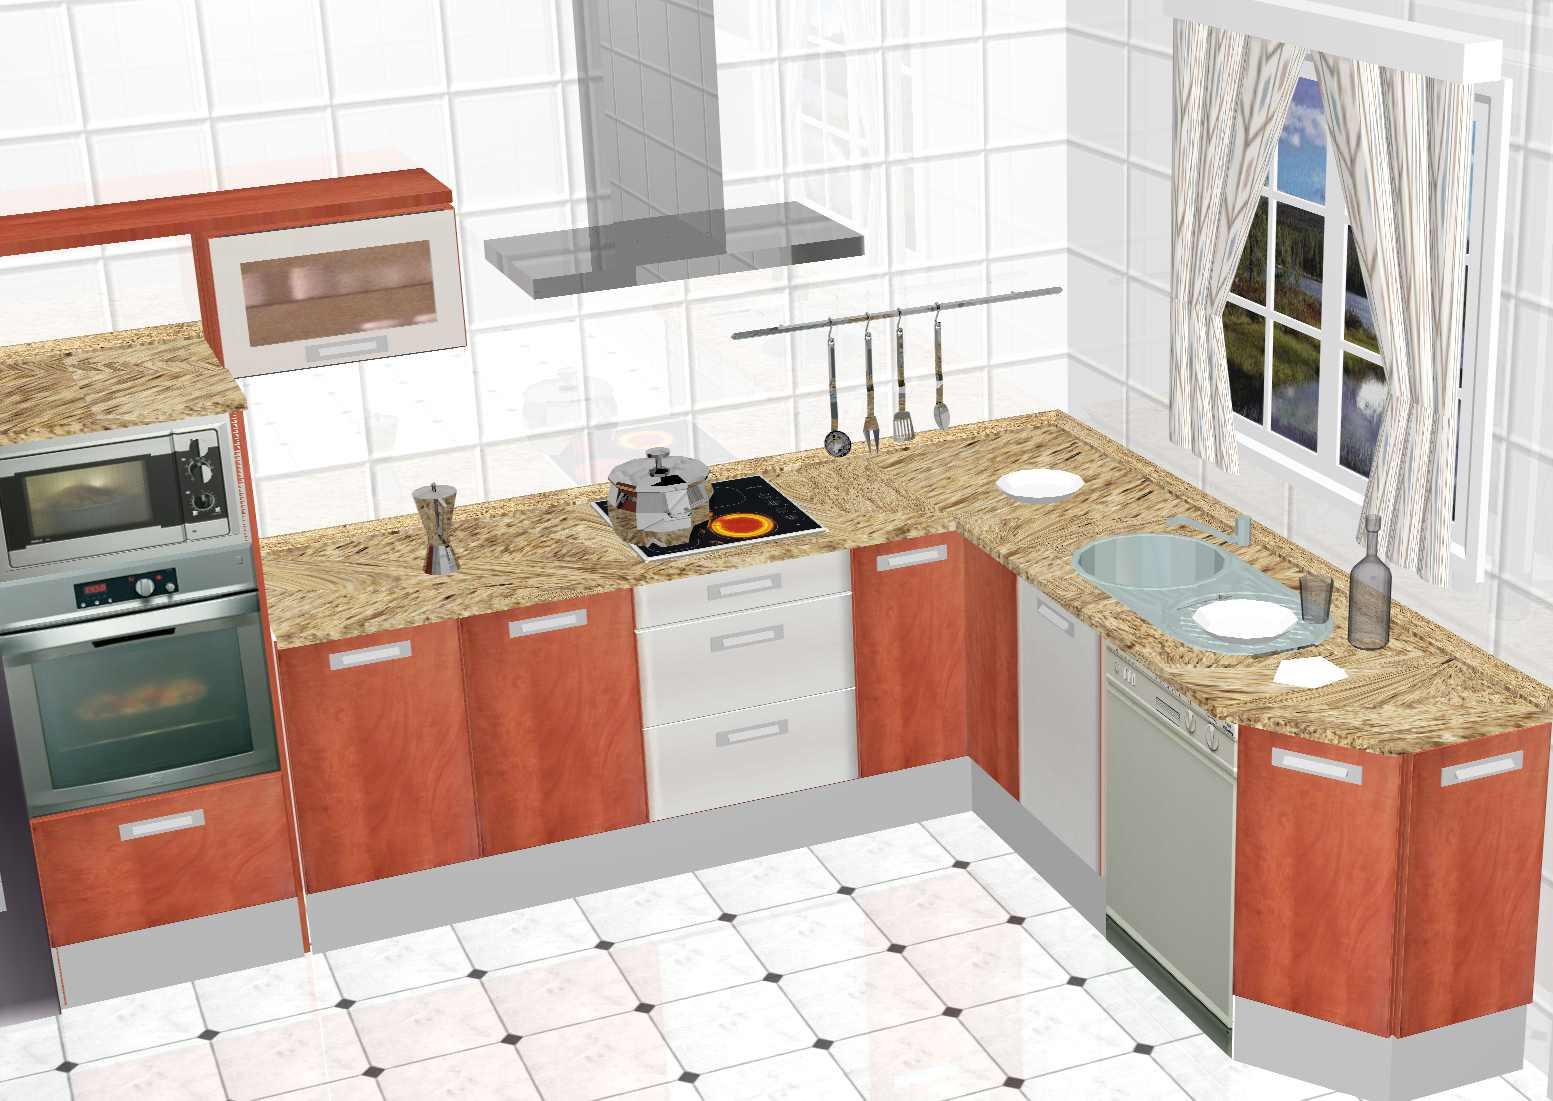 Dise o de cocinas en 3d fotorealismo planos dise o de for Planos de cocinas 4x4